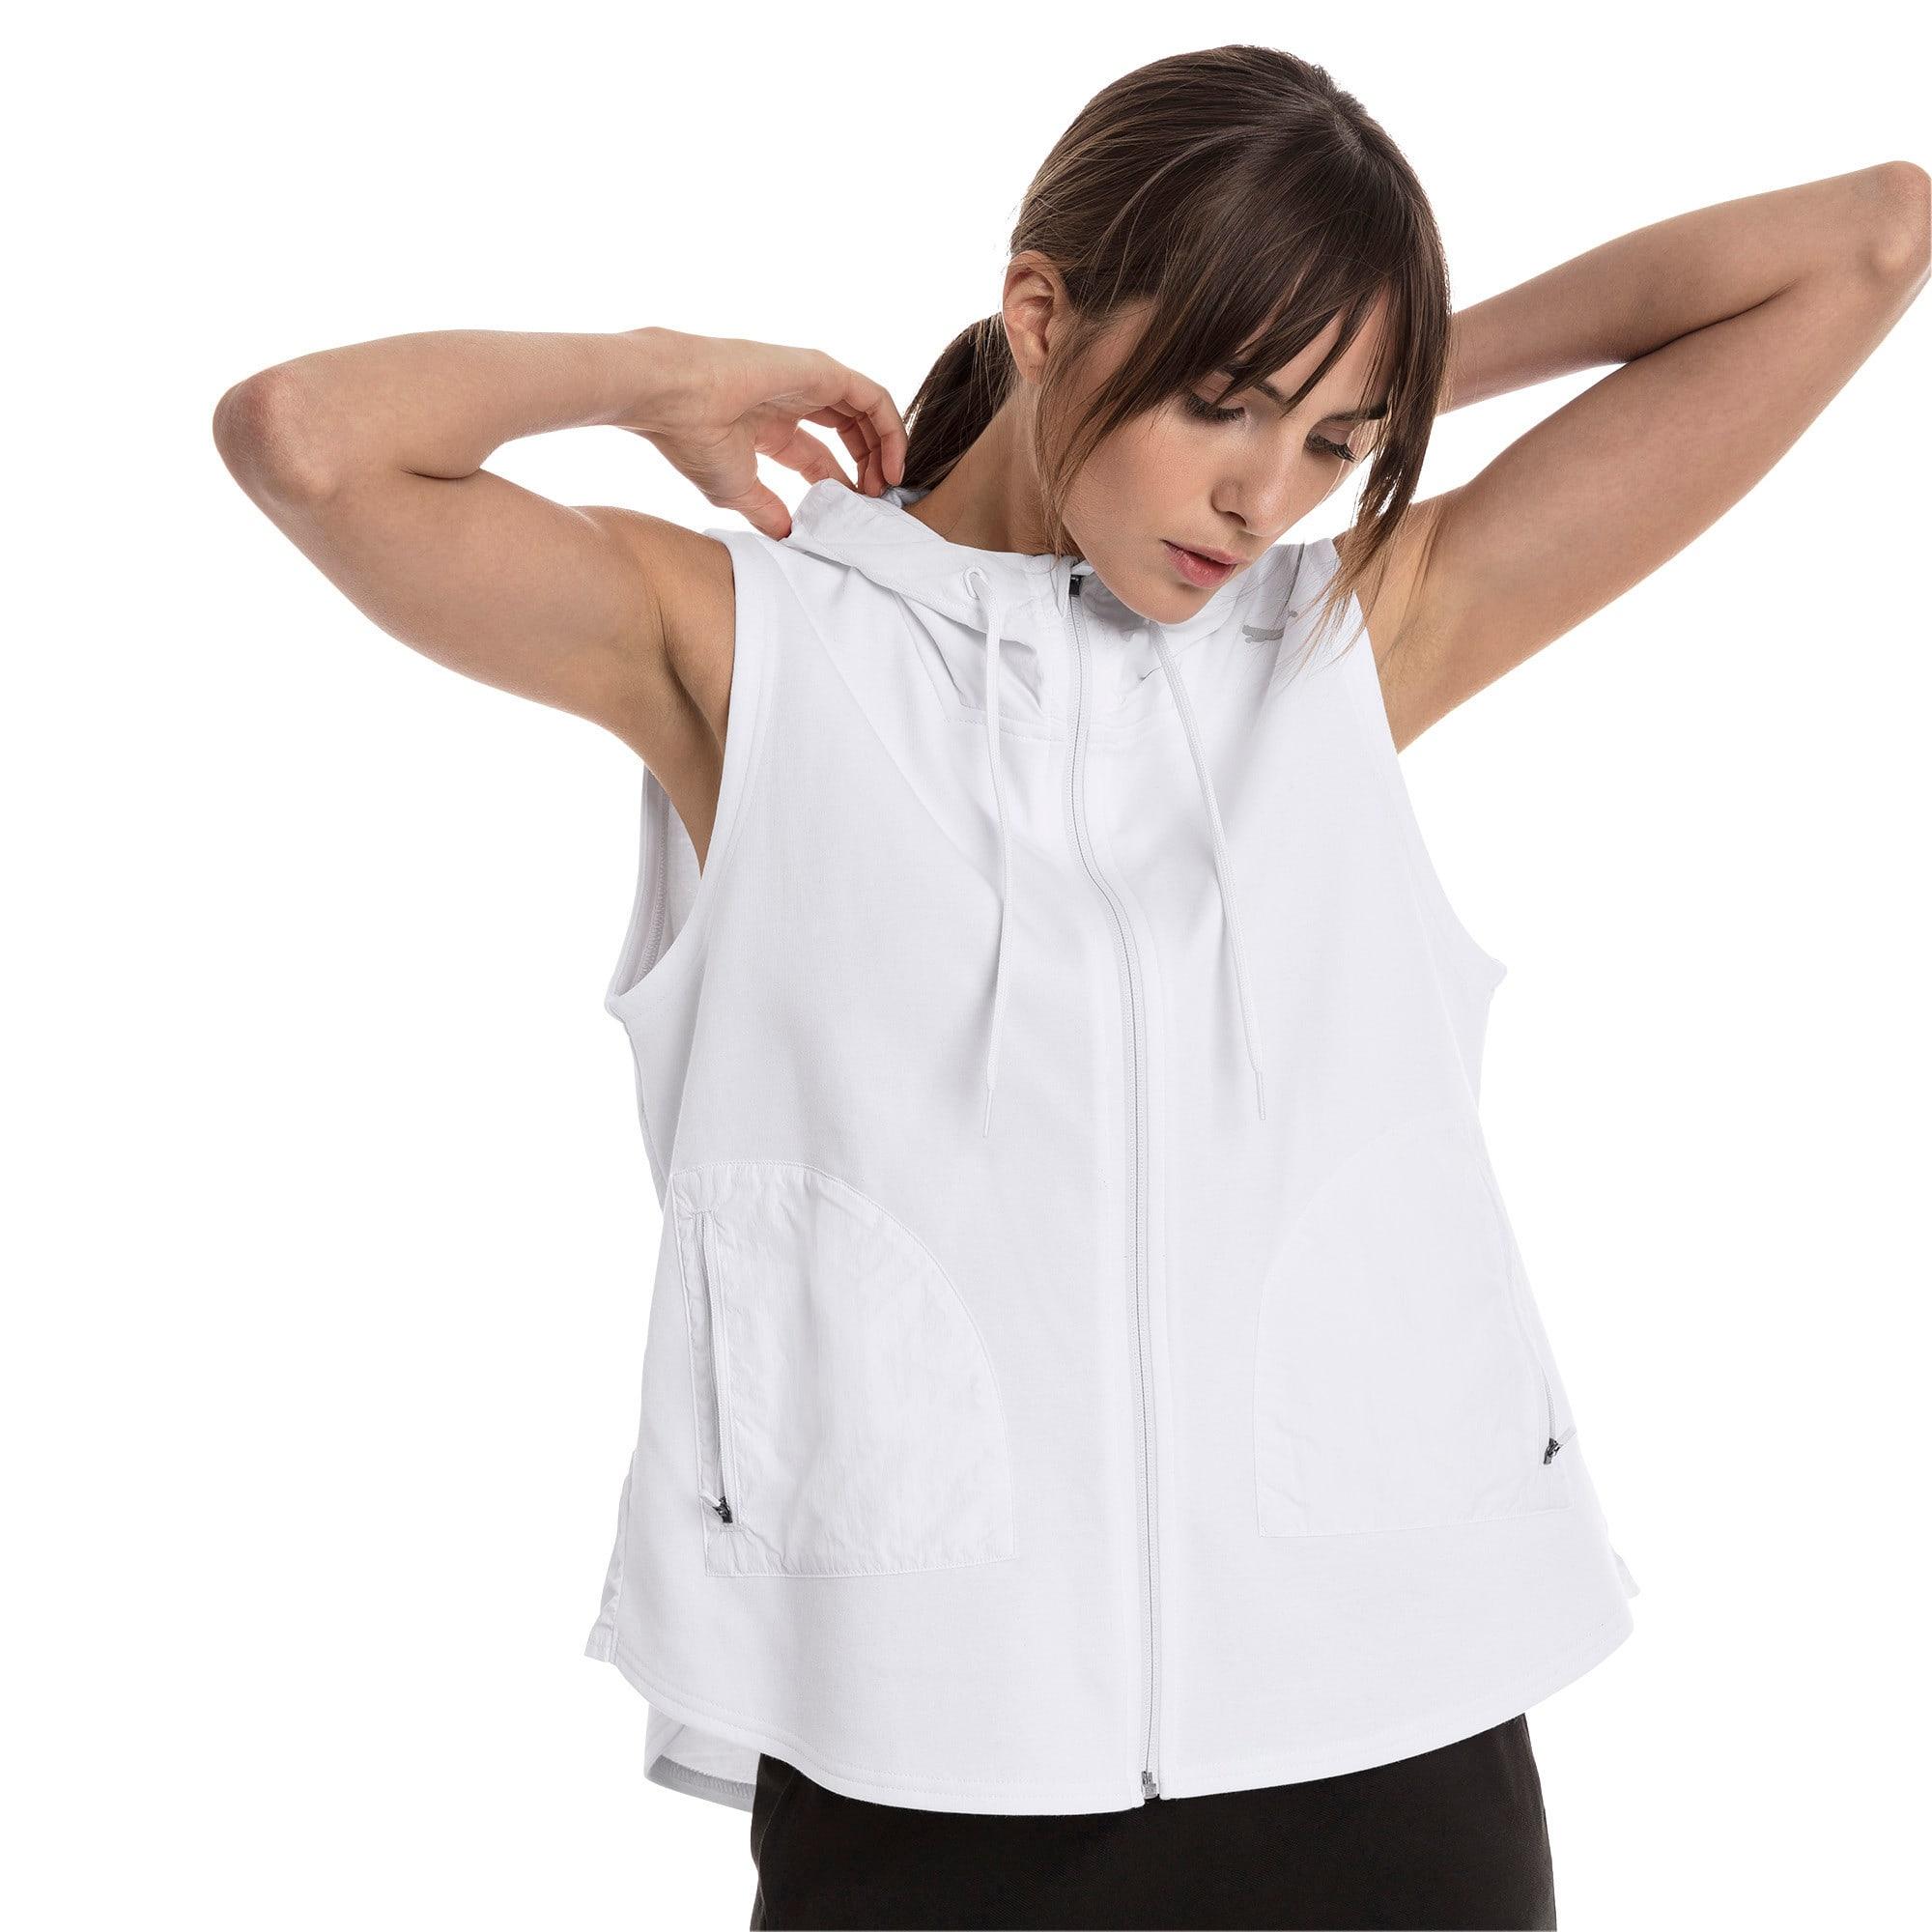 Thumbnail 2 of Evostripe Lite Women's Sleeveless Hooded Jacket, Puma White, medium